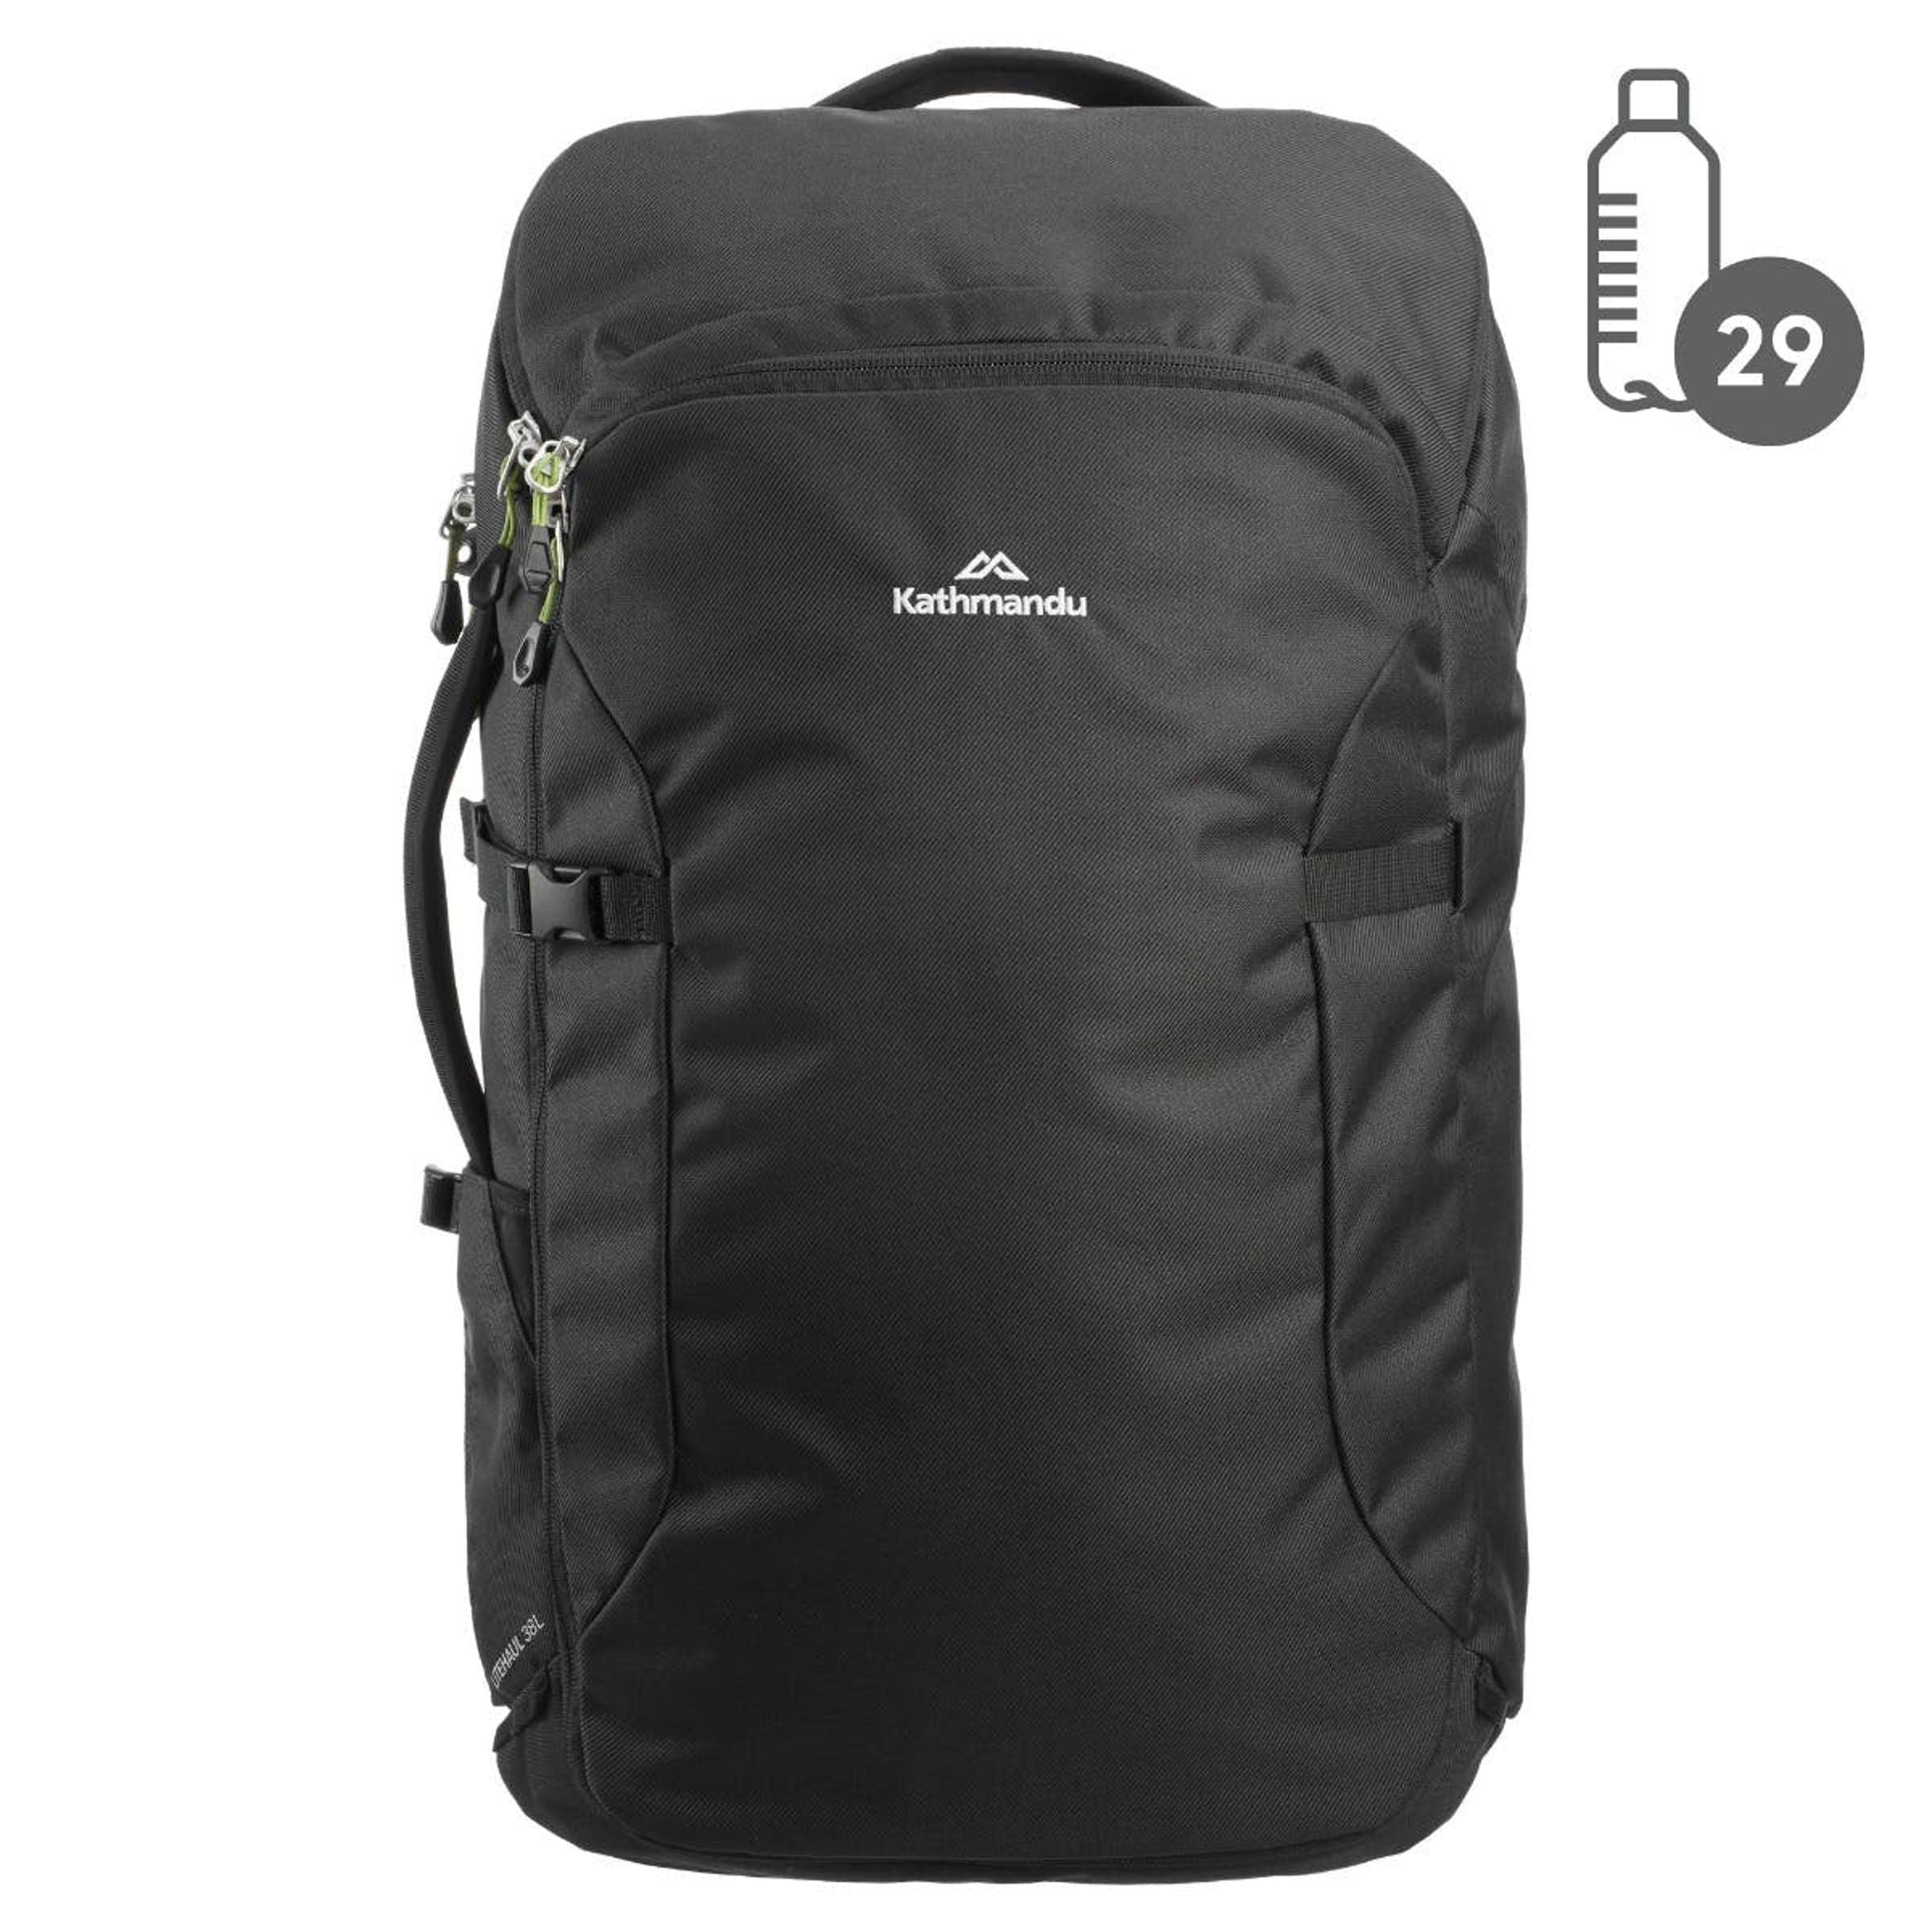 97db27c2855d Litehaul 38L Carry-On Cabin Bag Sized Pack